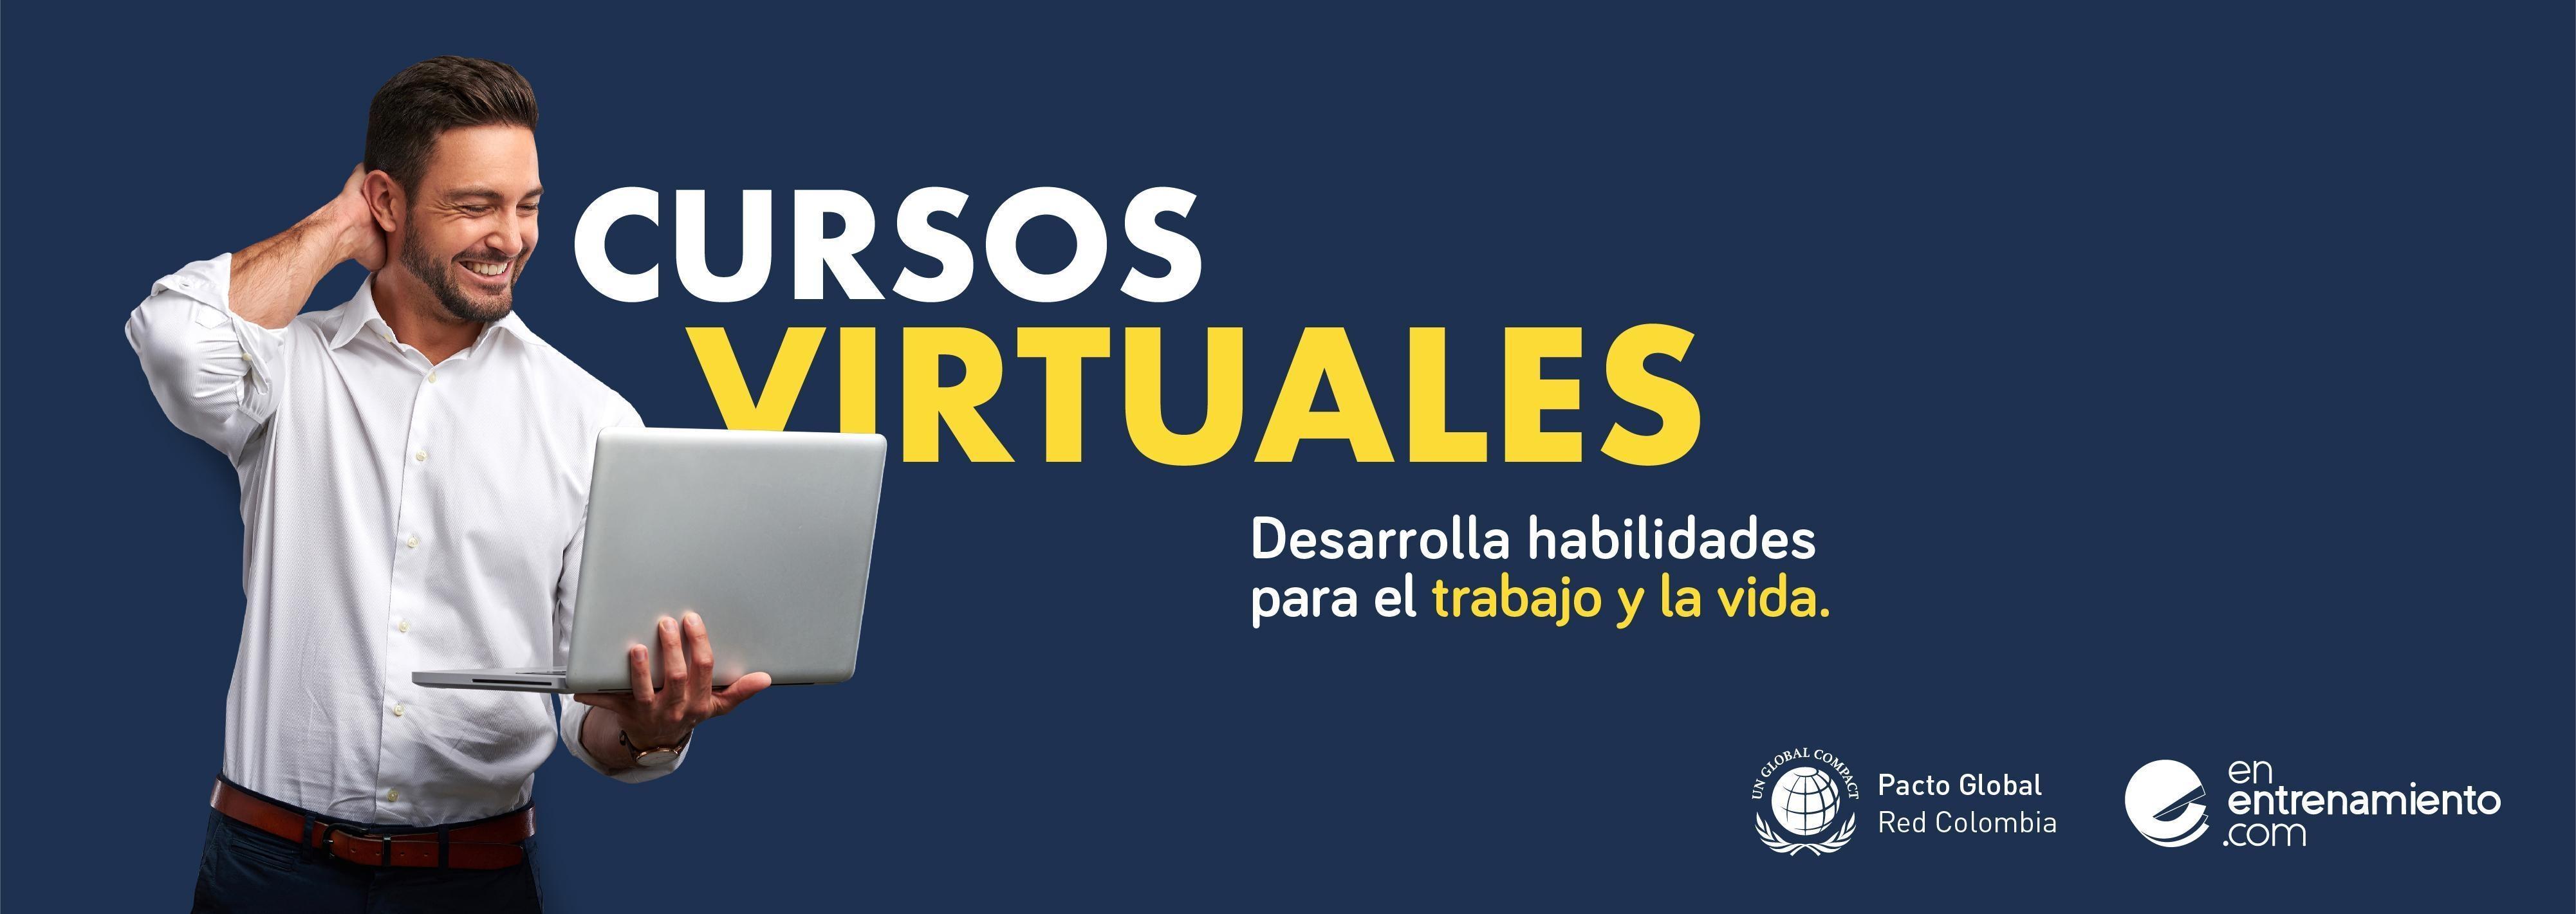 banner-cursos-virtuales